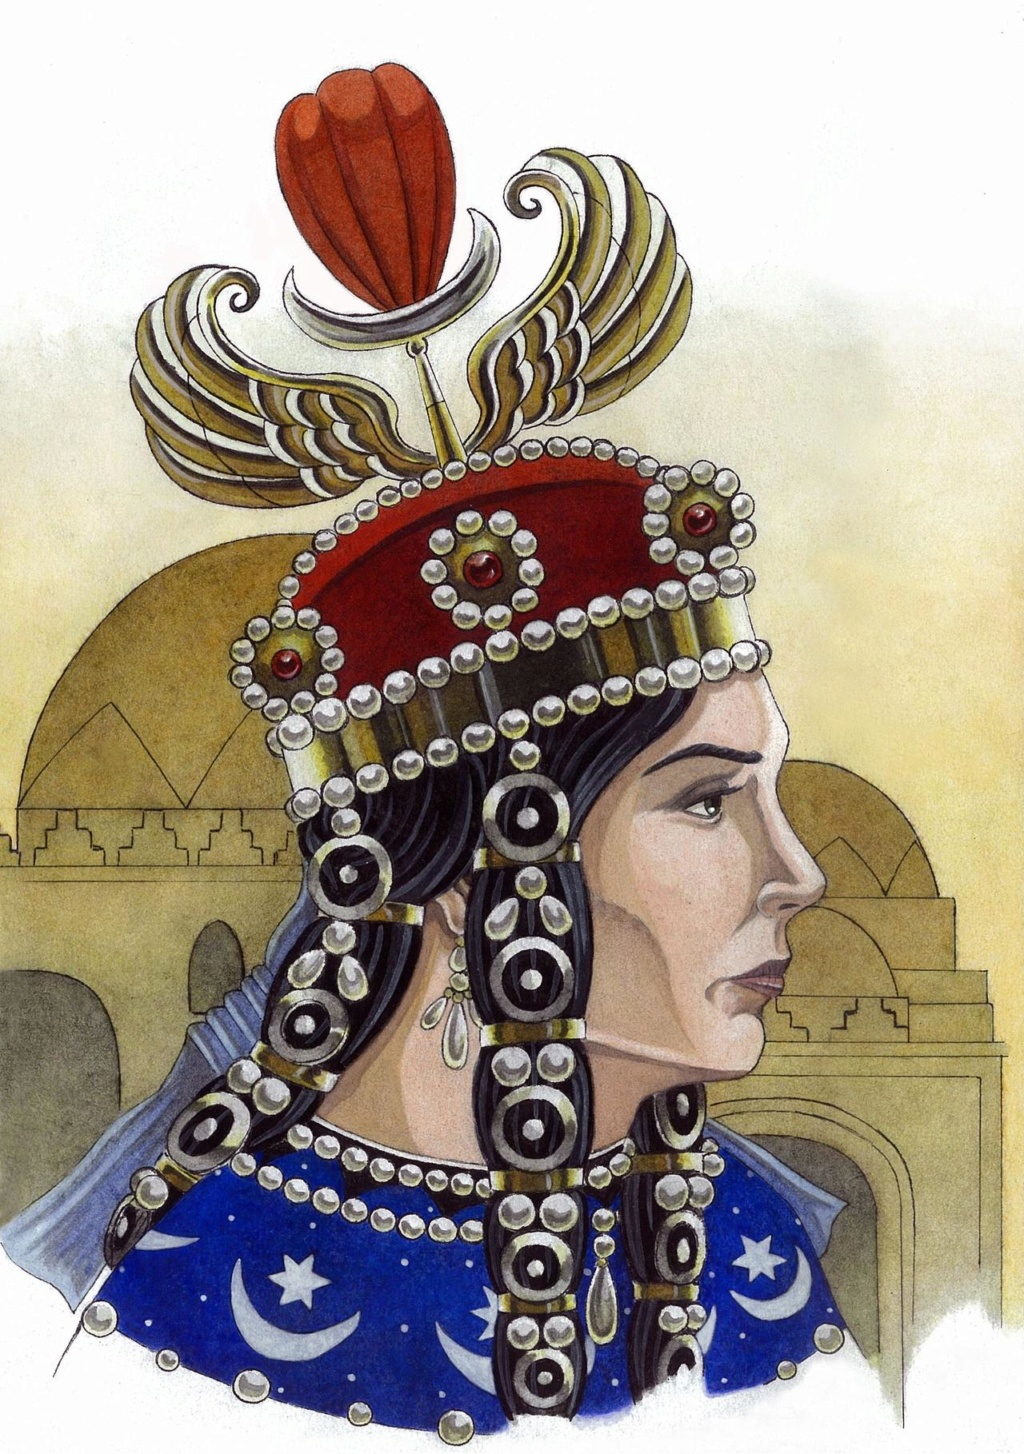 Dracma de plata. Reina Boran, Imperio Sasanida. 628 o 631d.C. Dedit Maestro Benyusuf Boran10